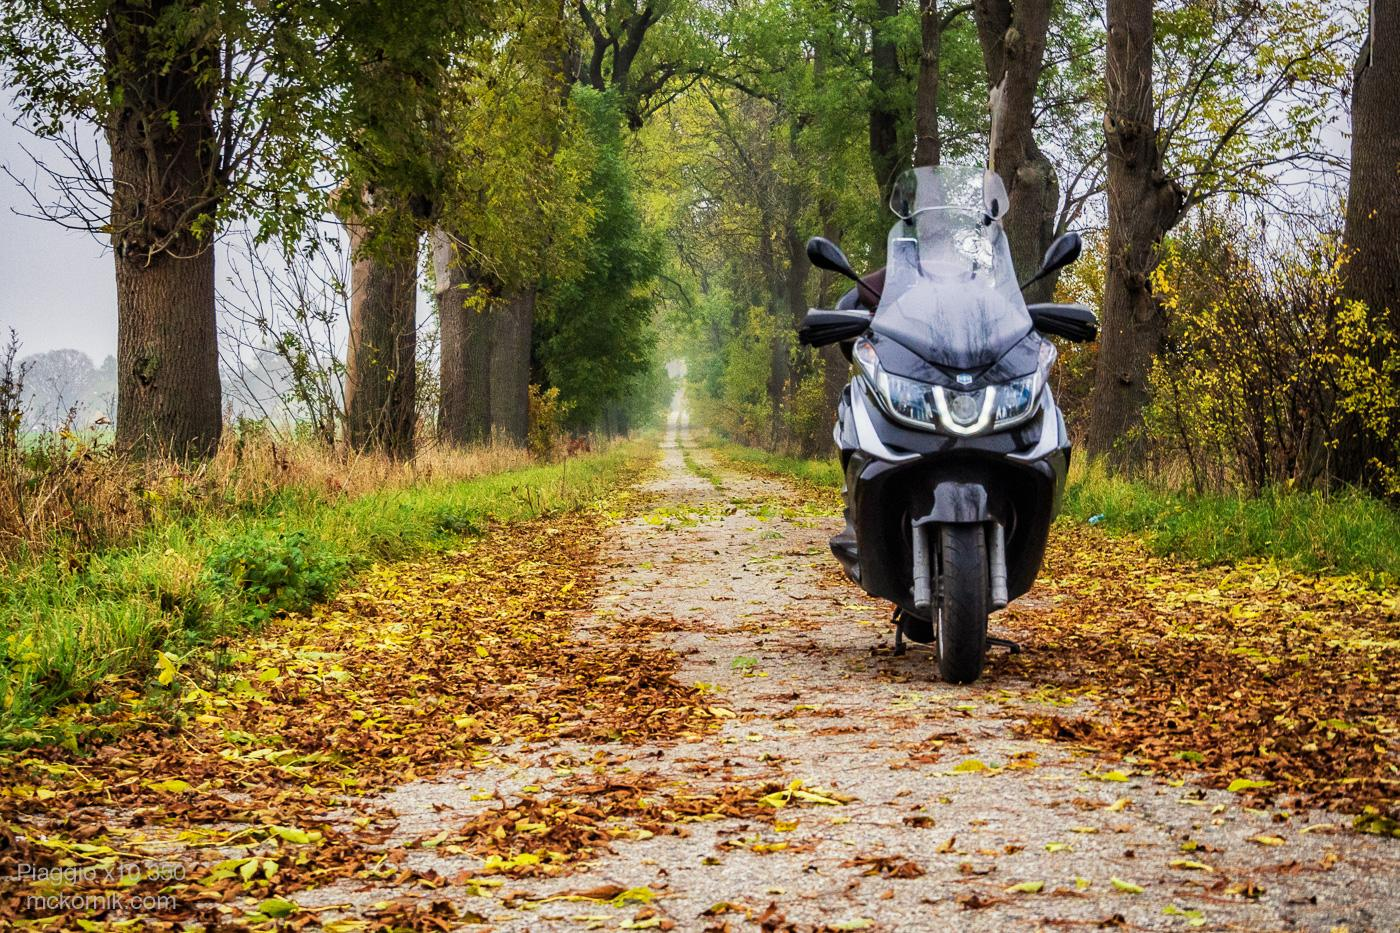 Jesienna jazda skuterem Piaggio x10 #piaggiox10350